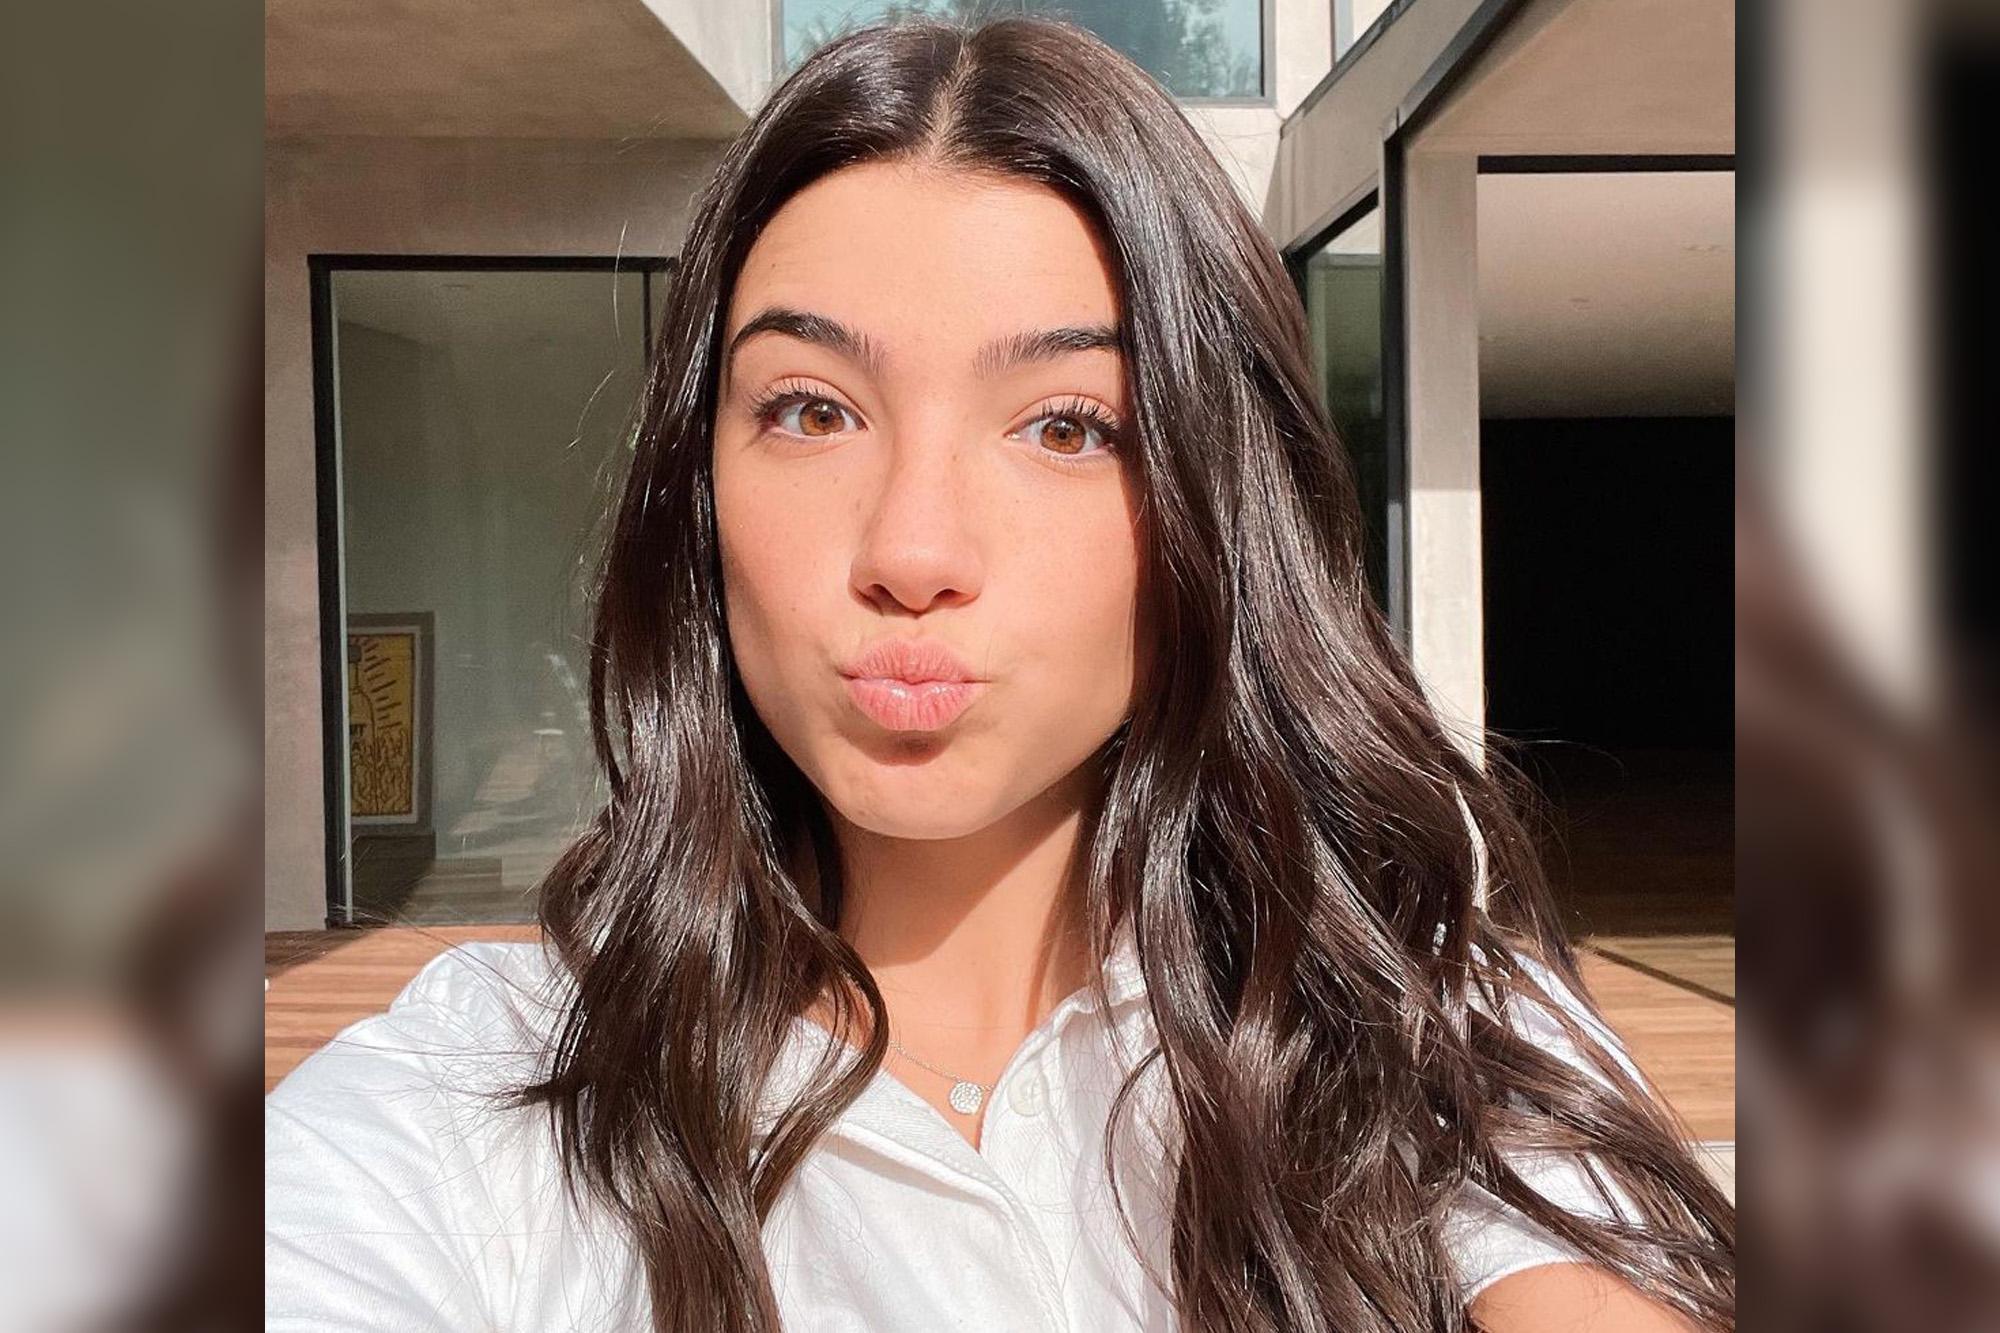 Charli D'Amelio reaches 100M TikTok followers despite backlash